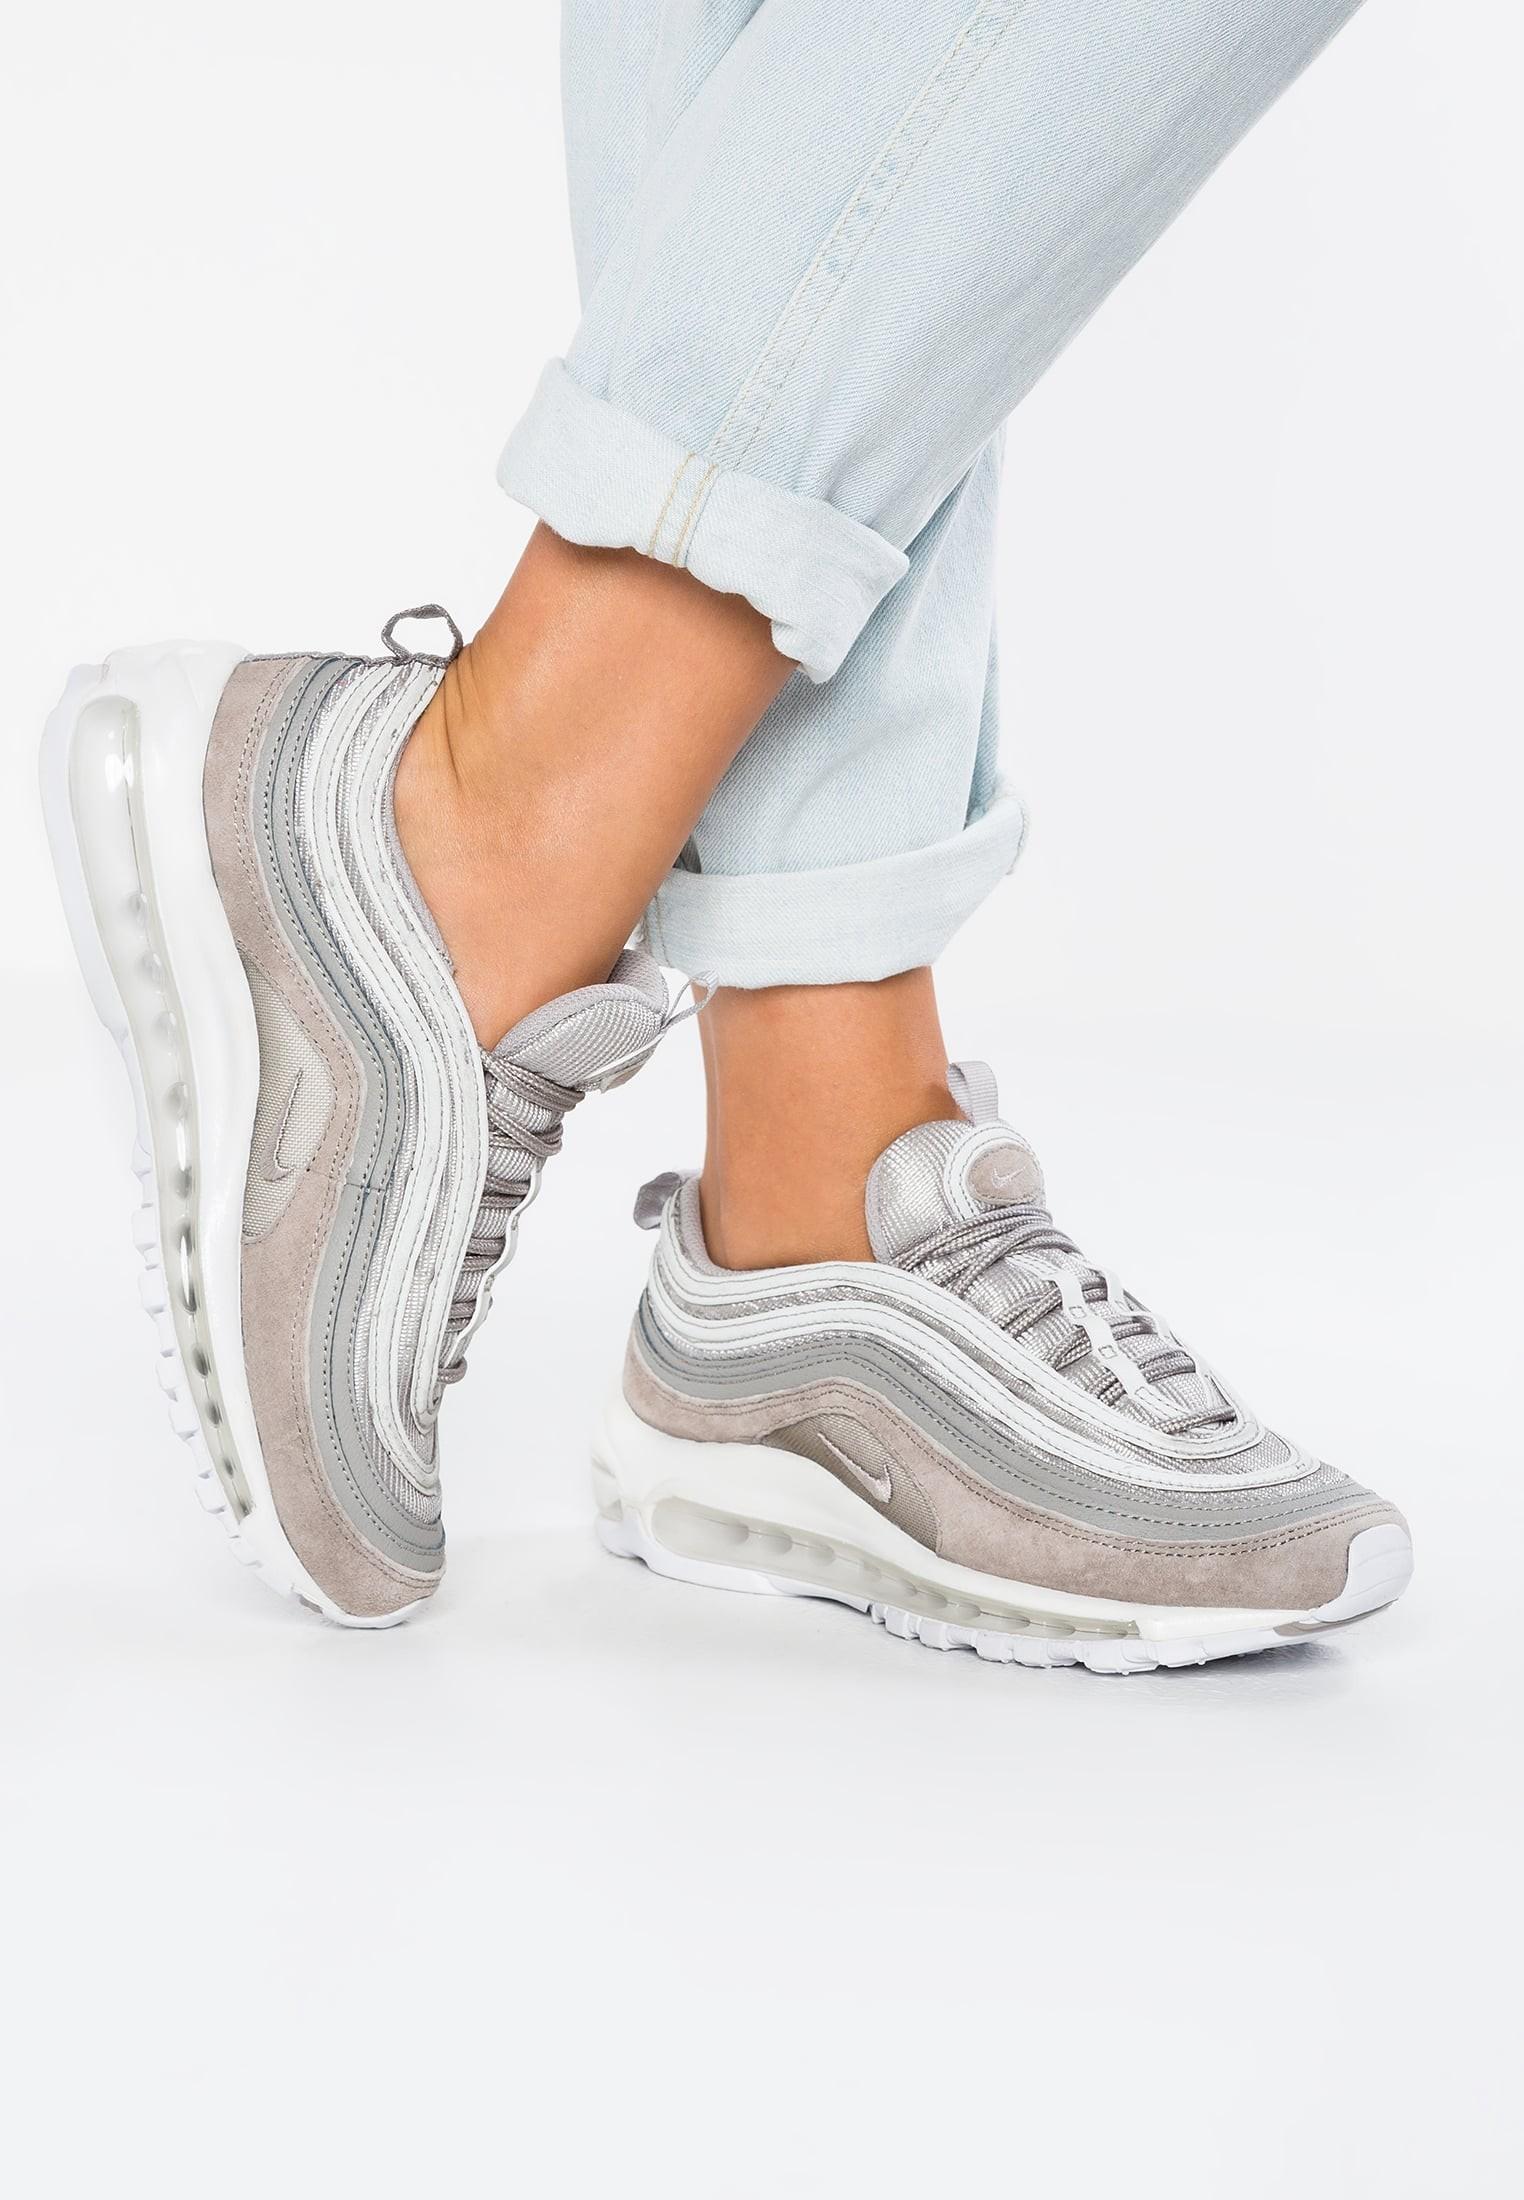 nike air max herrenschuhe 97 sneakers Kostenloser Versand!